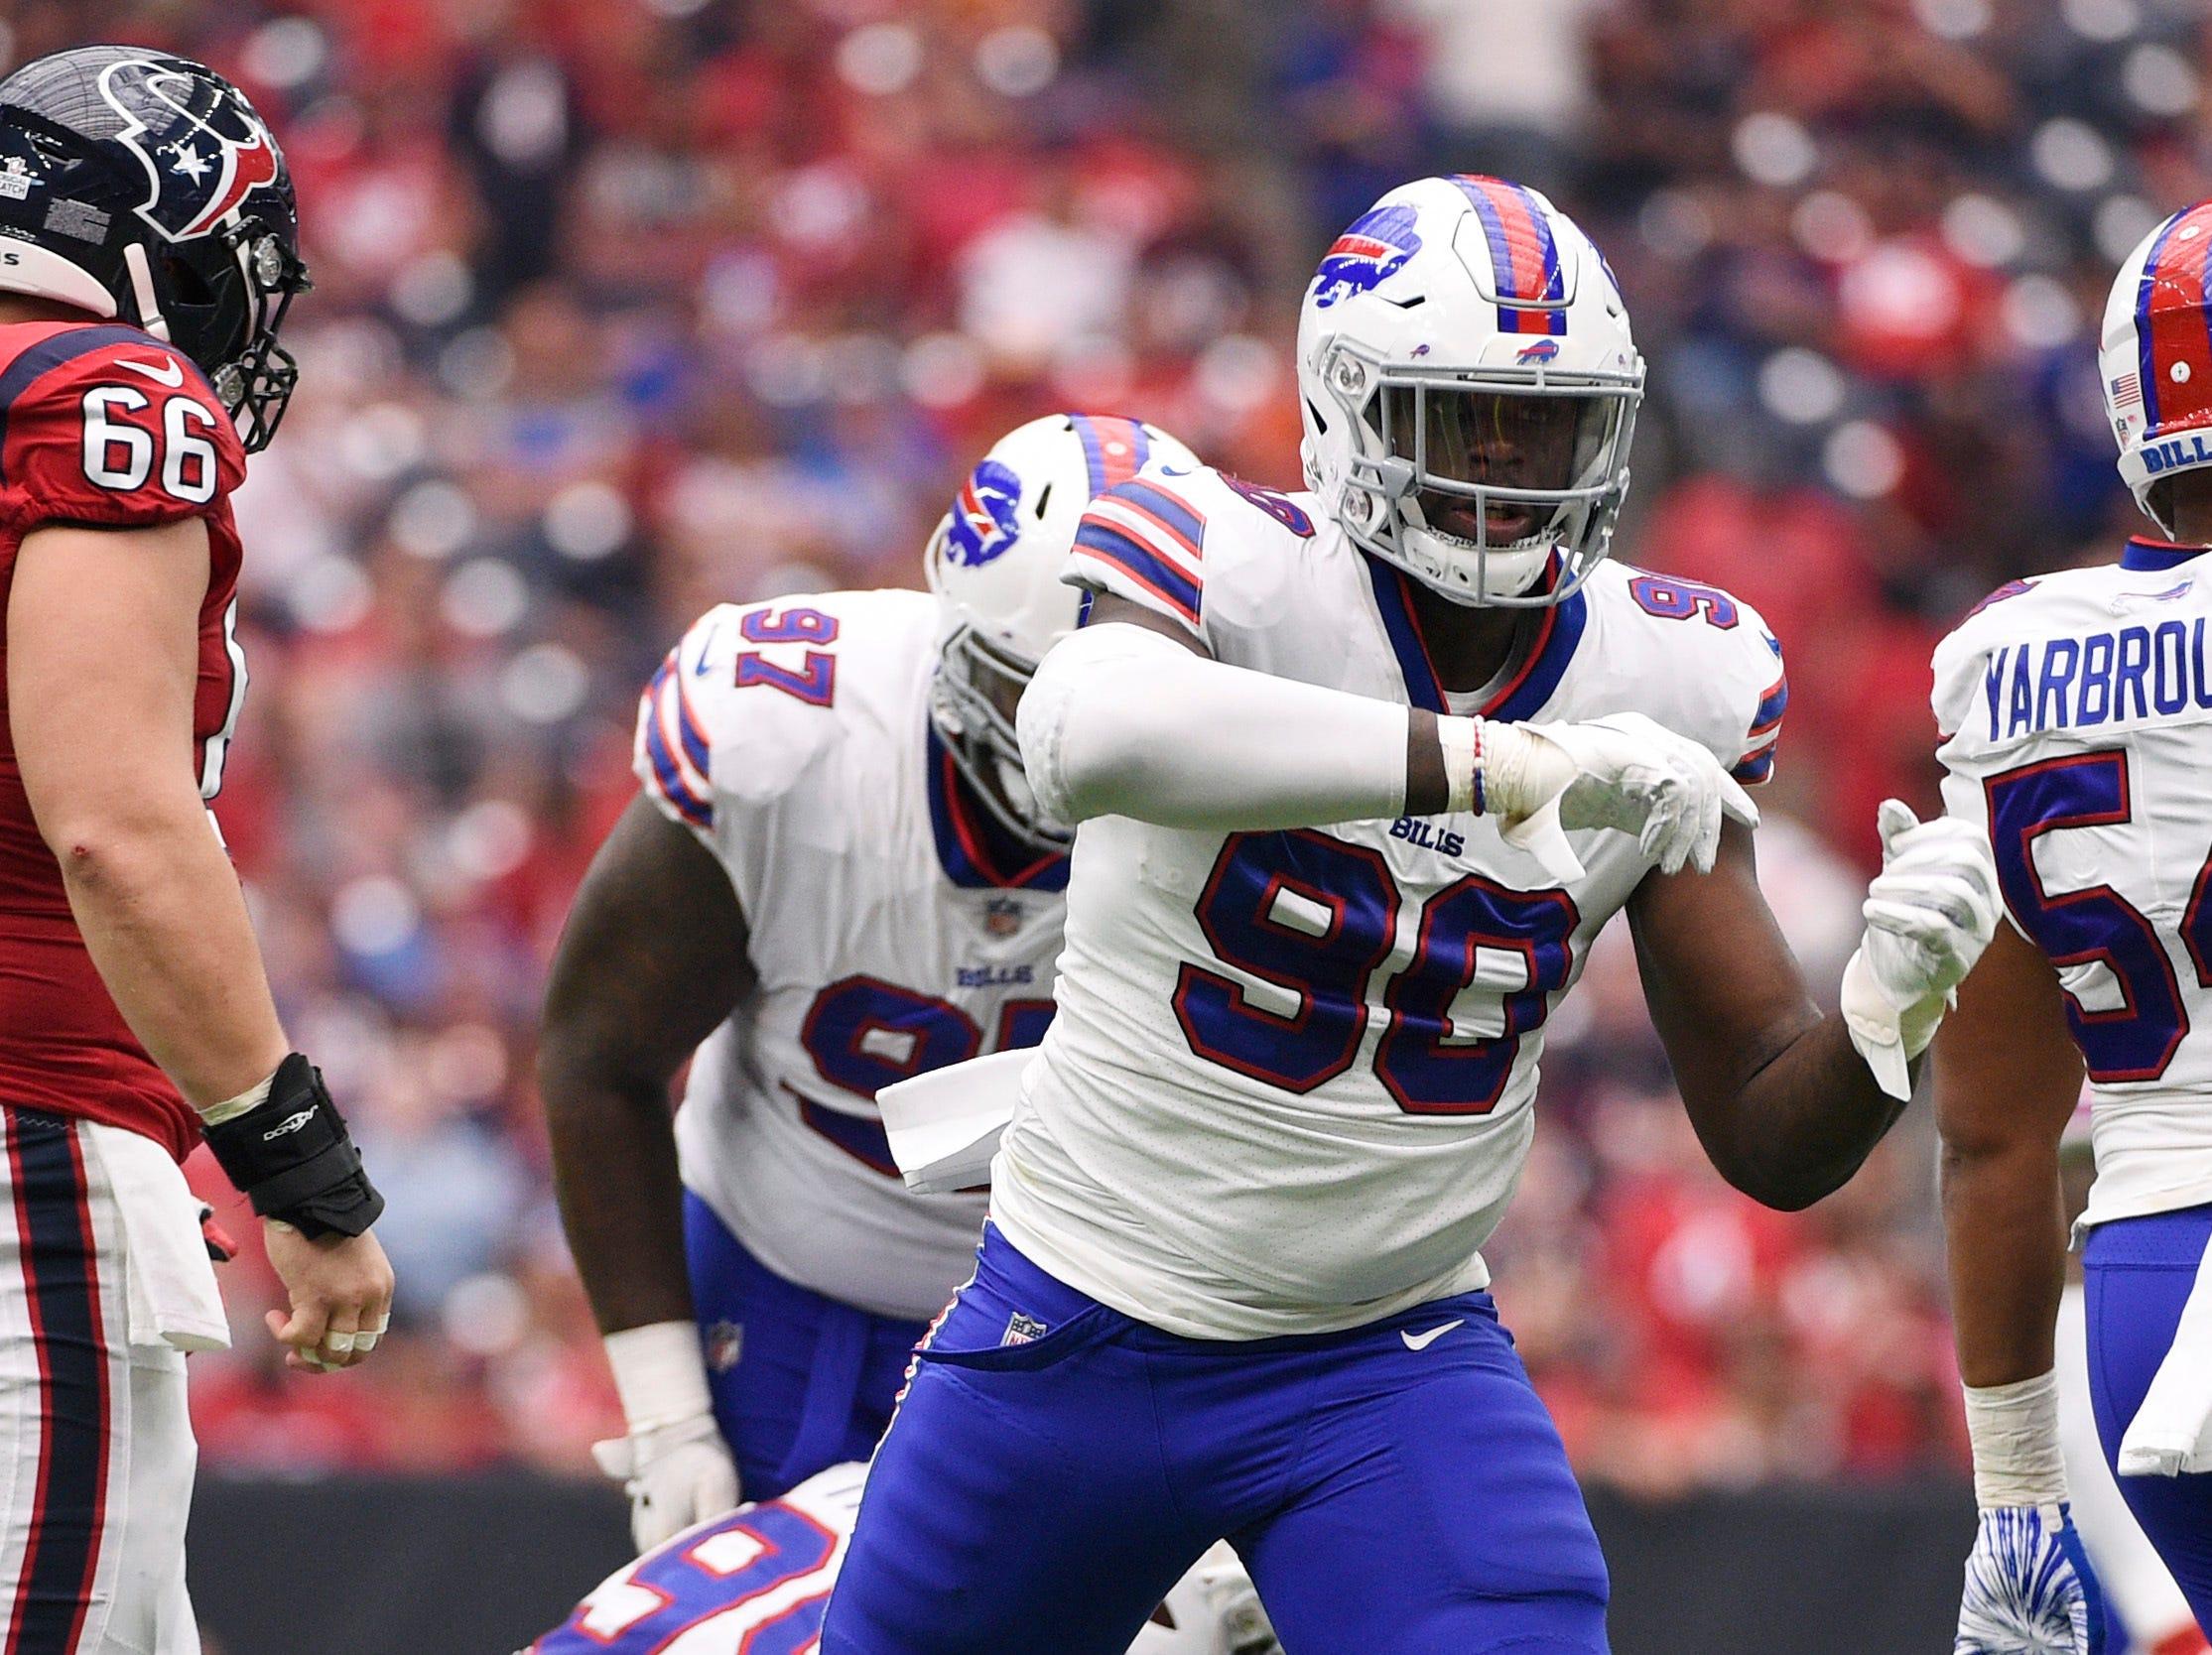 Buffalo Bills defensive end Shaq Lawson (90) celebrates after sacking Houston Texans quarterback Deshaun Watson (4) during the second half of an NFL football game, Sunday, Oct. 14, 2018, in Houston. (AP Photo/Eric Christian Smith)